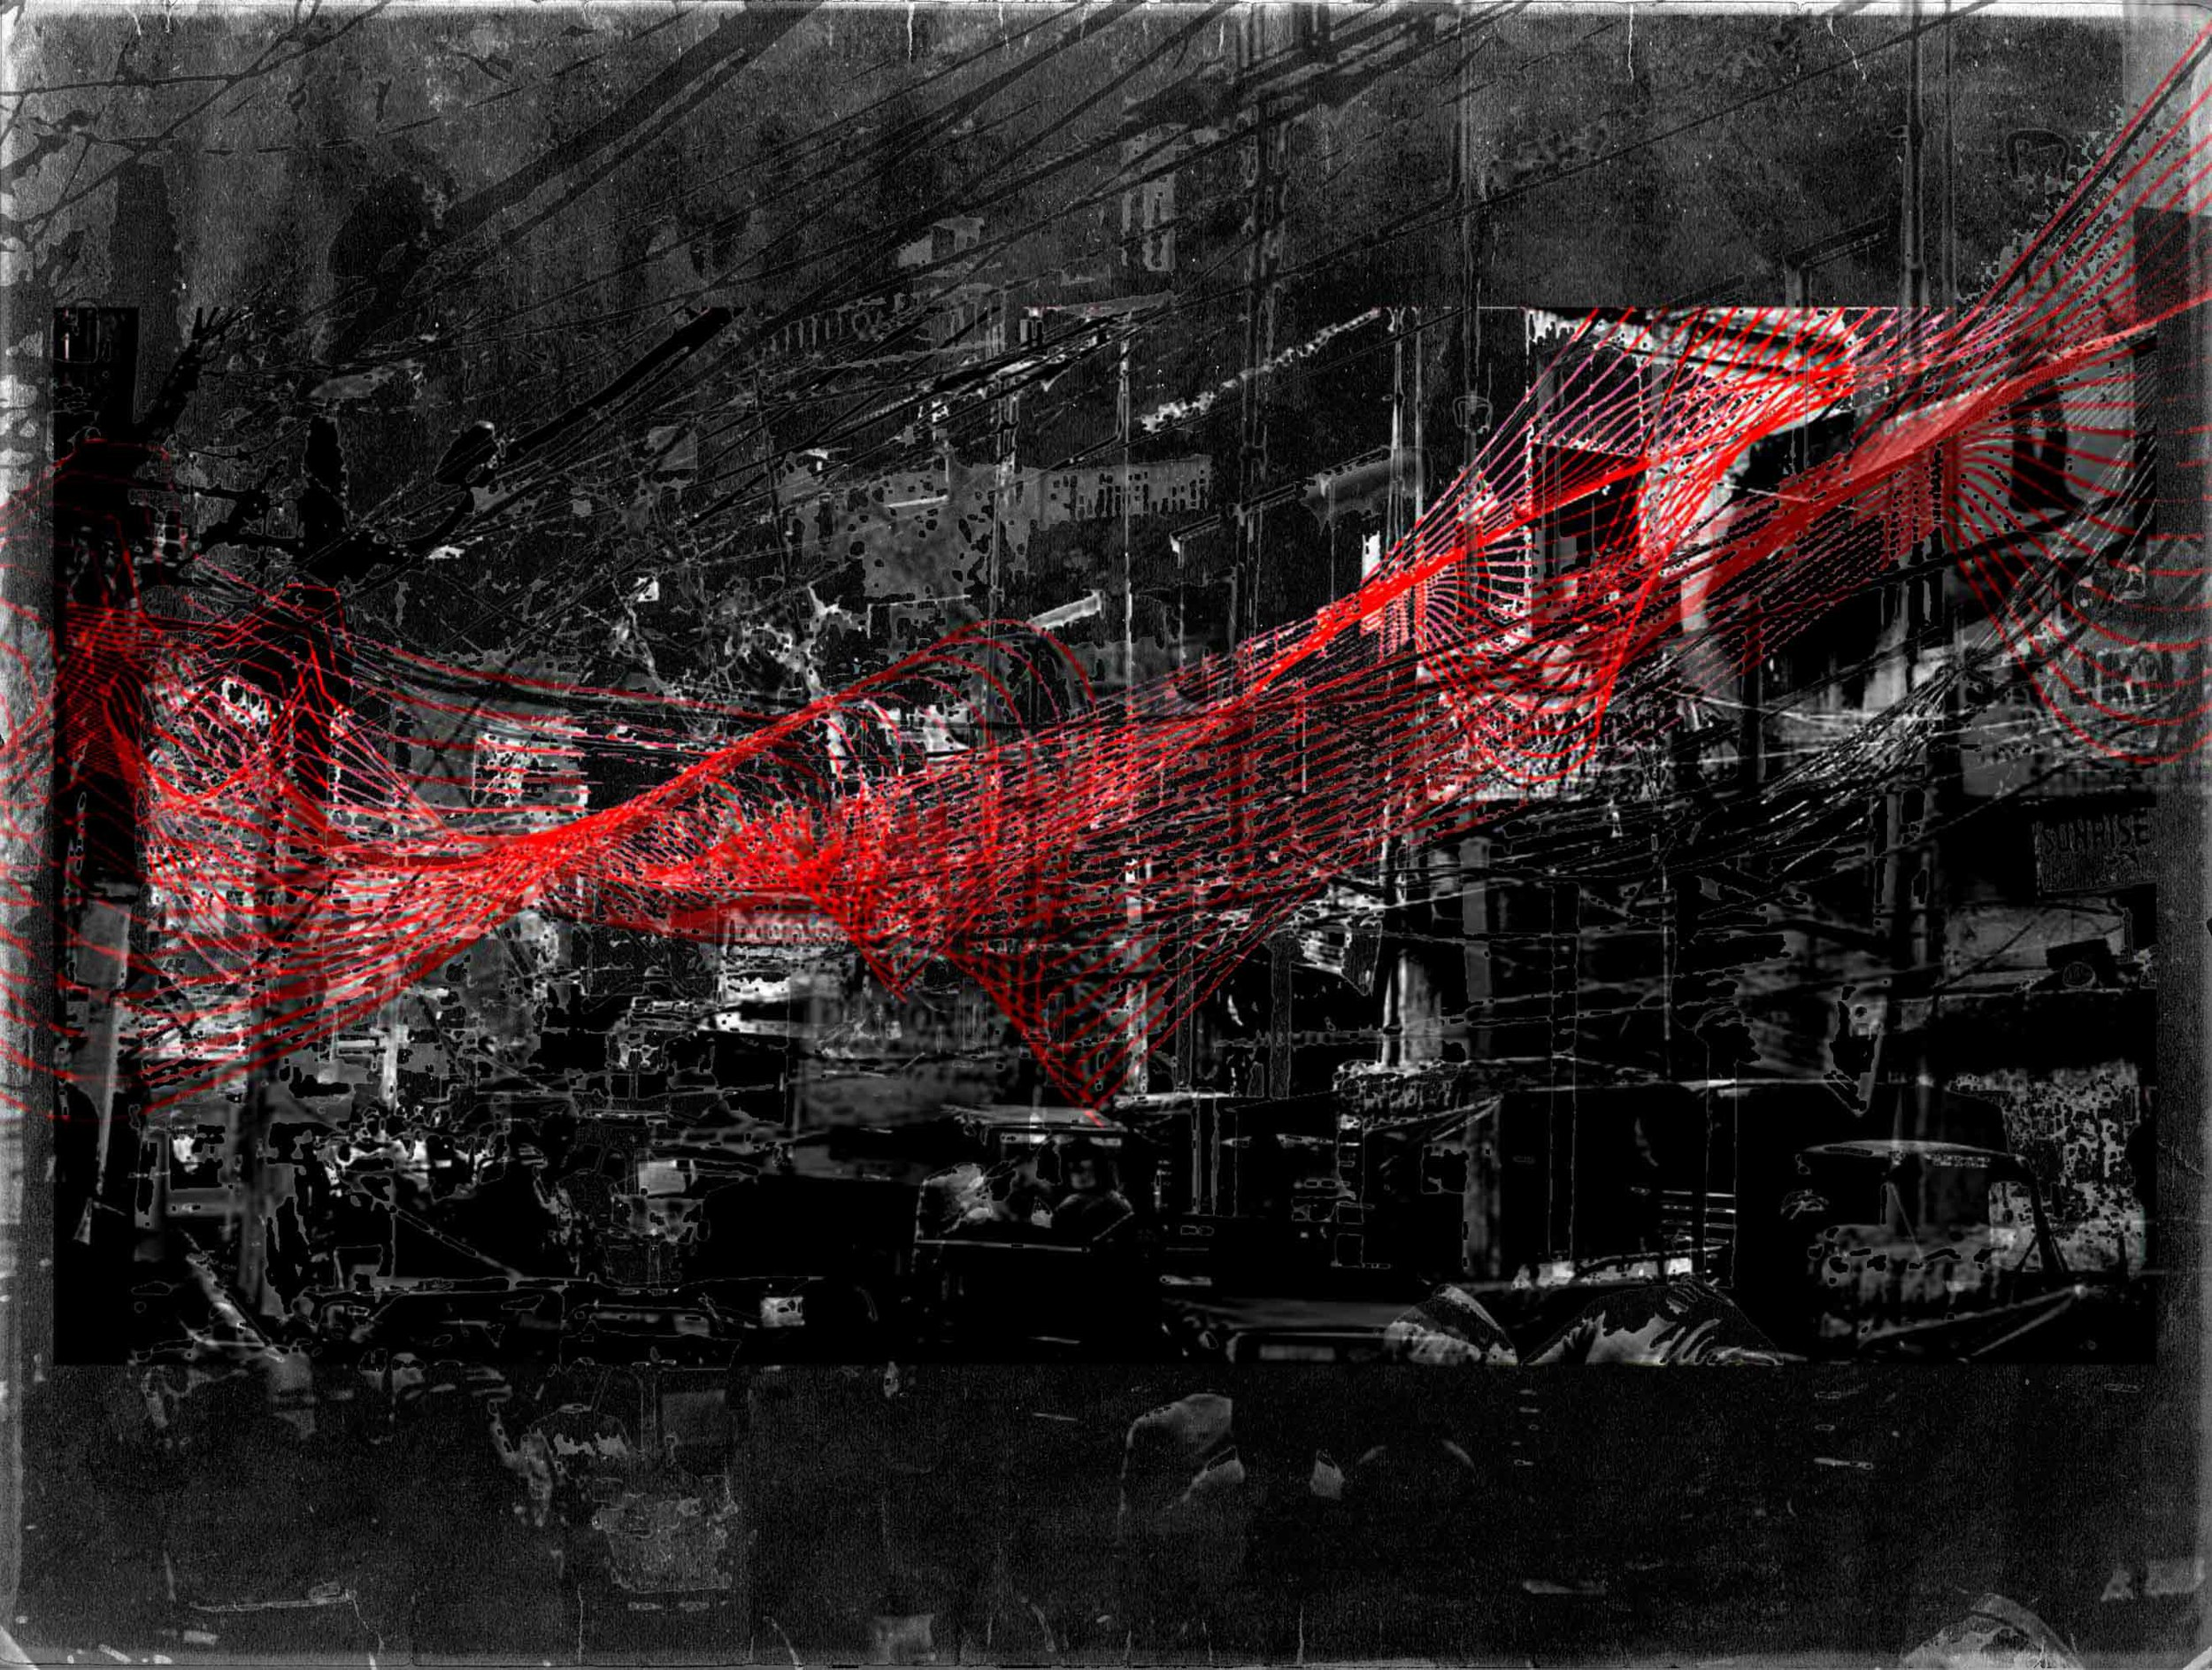 keleloko_City congestion screenprint 02a.jpg